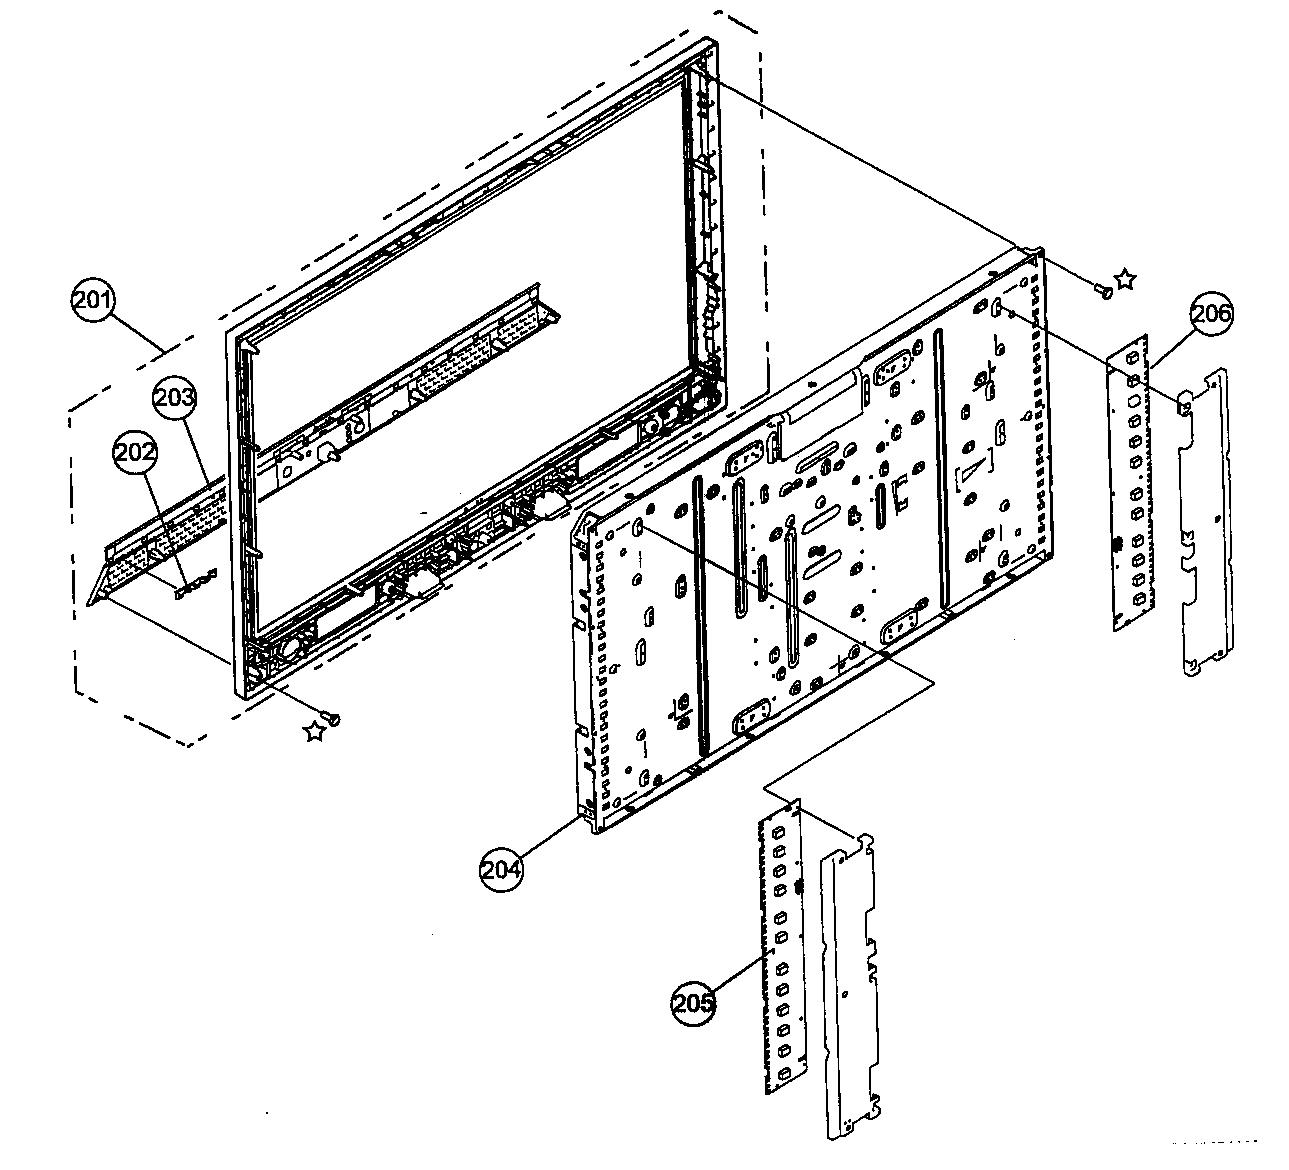 Sony model KDL-40V3000 lcd television genuine parts